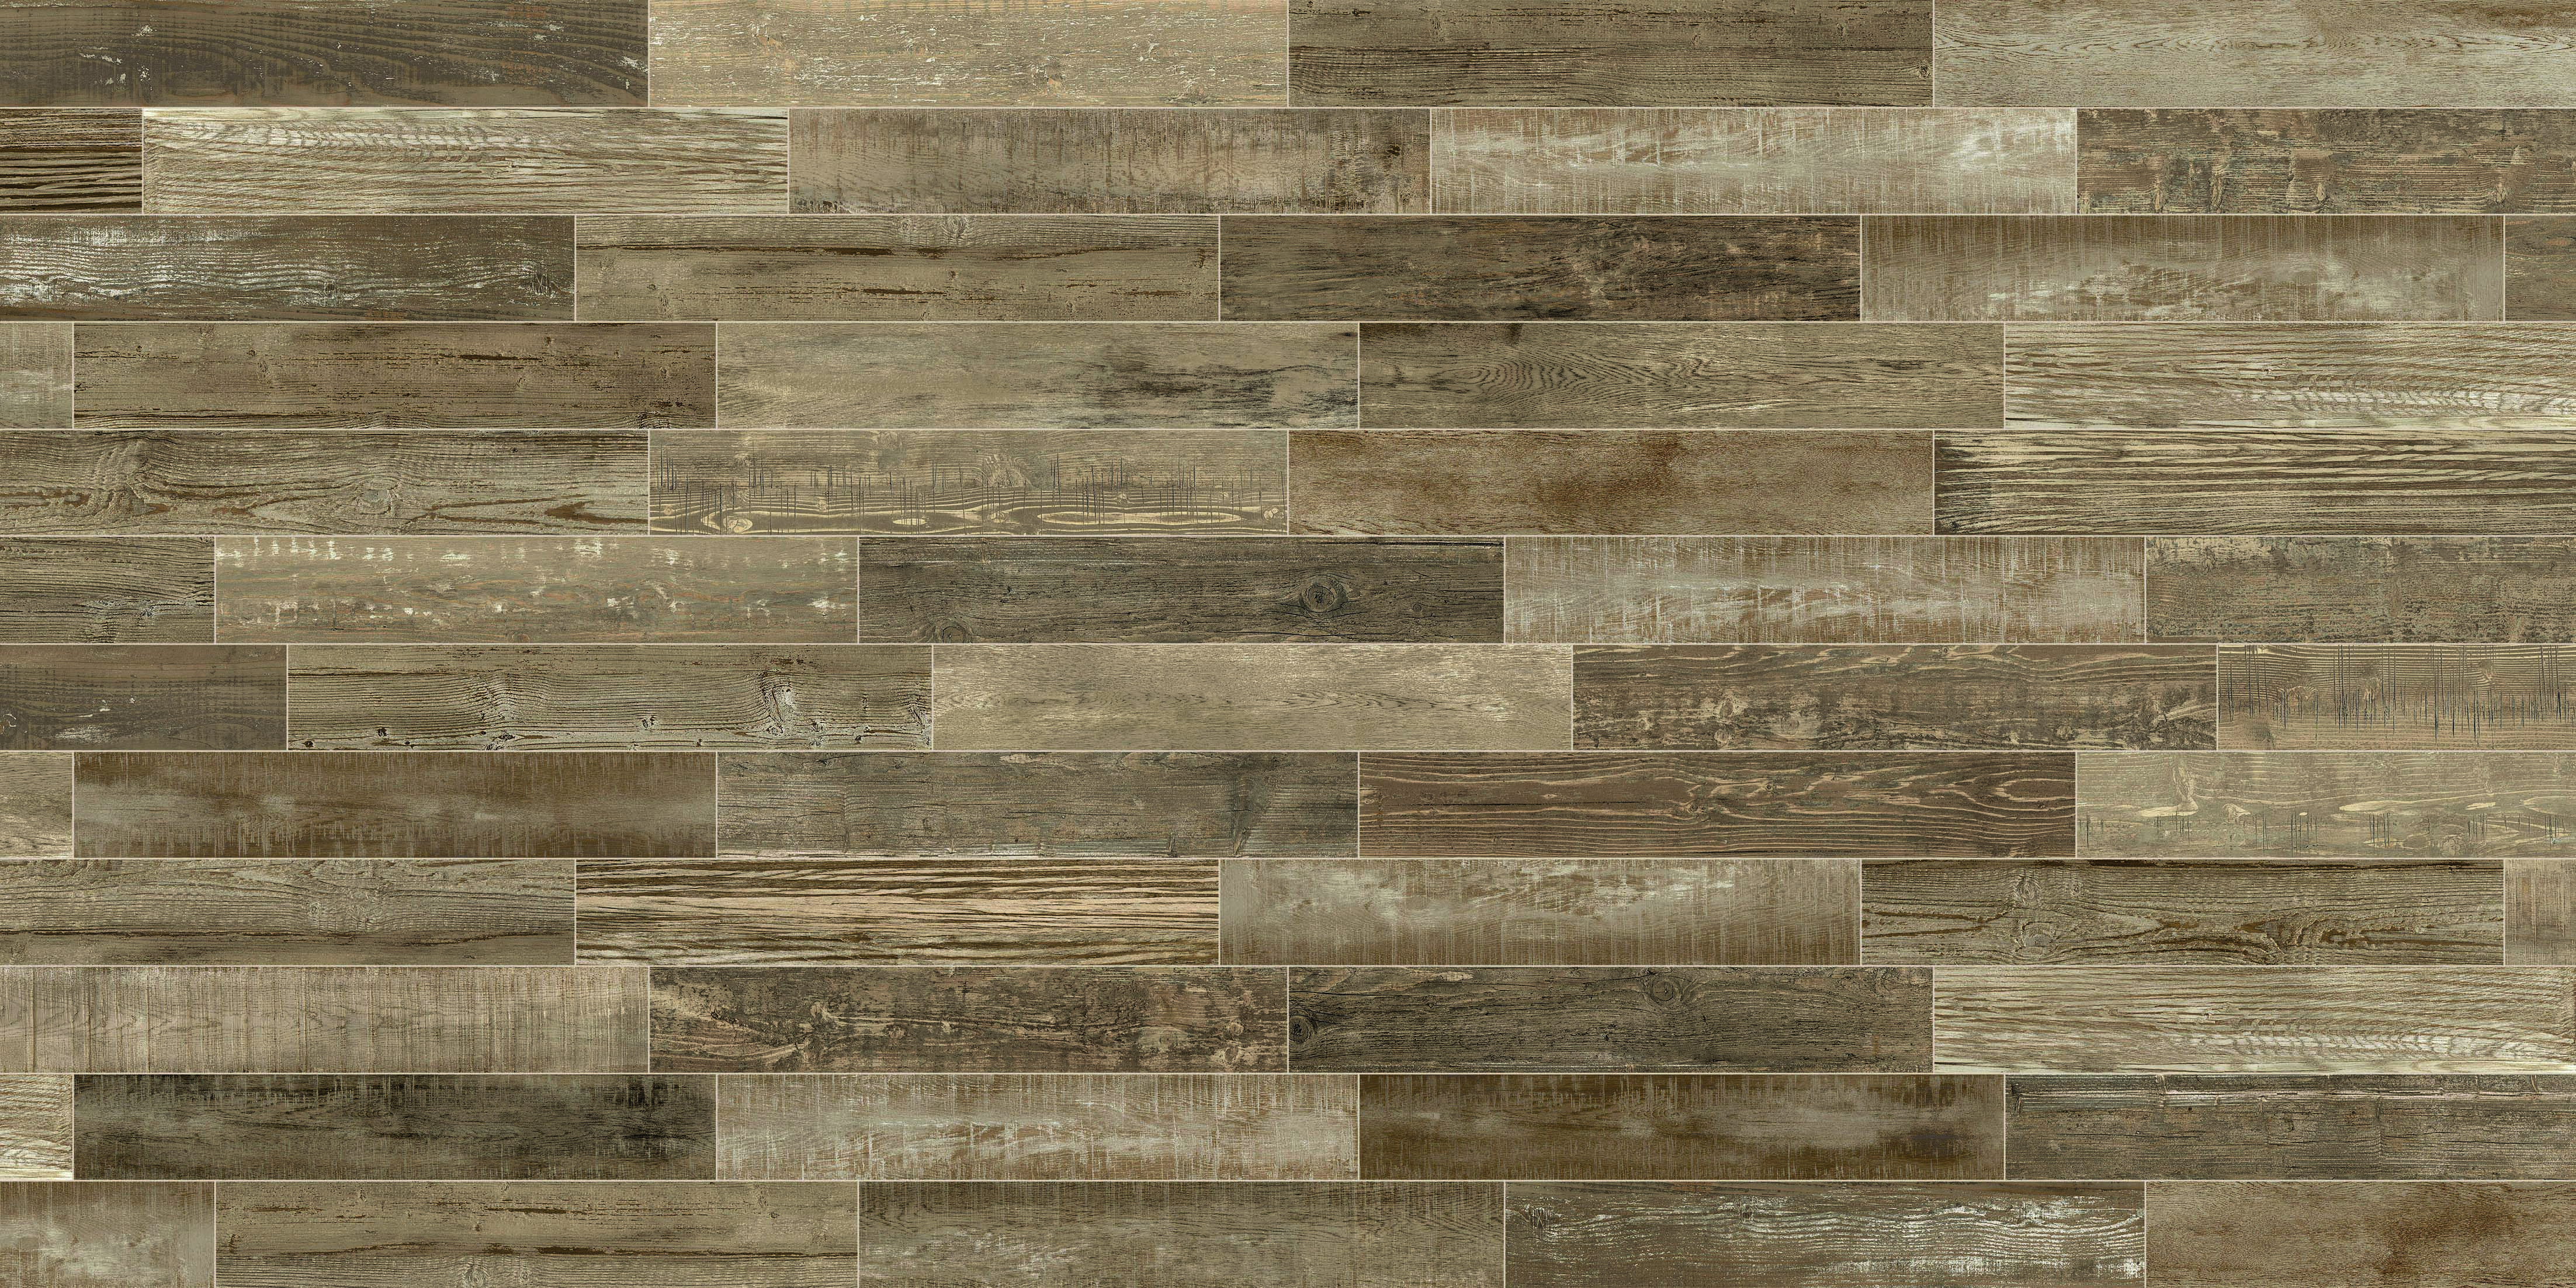 italgraniti-scrapwood-iederverwertetem Holz-vintage-metalloptik-rost